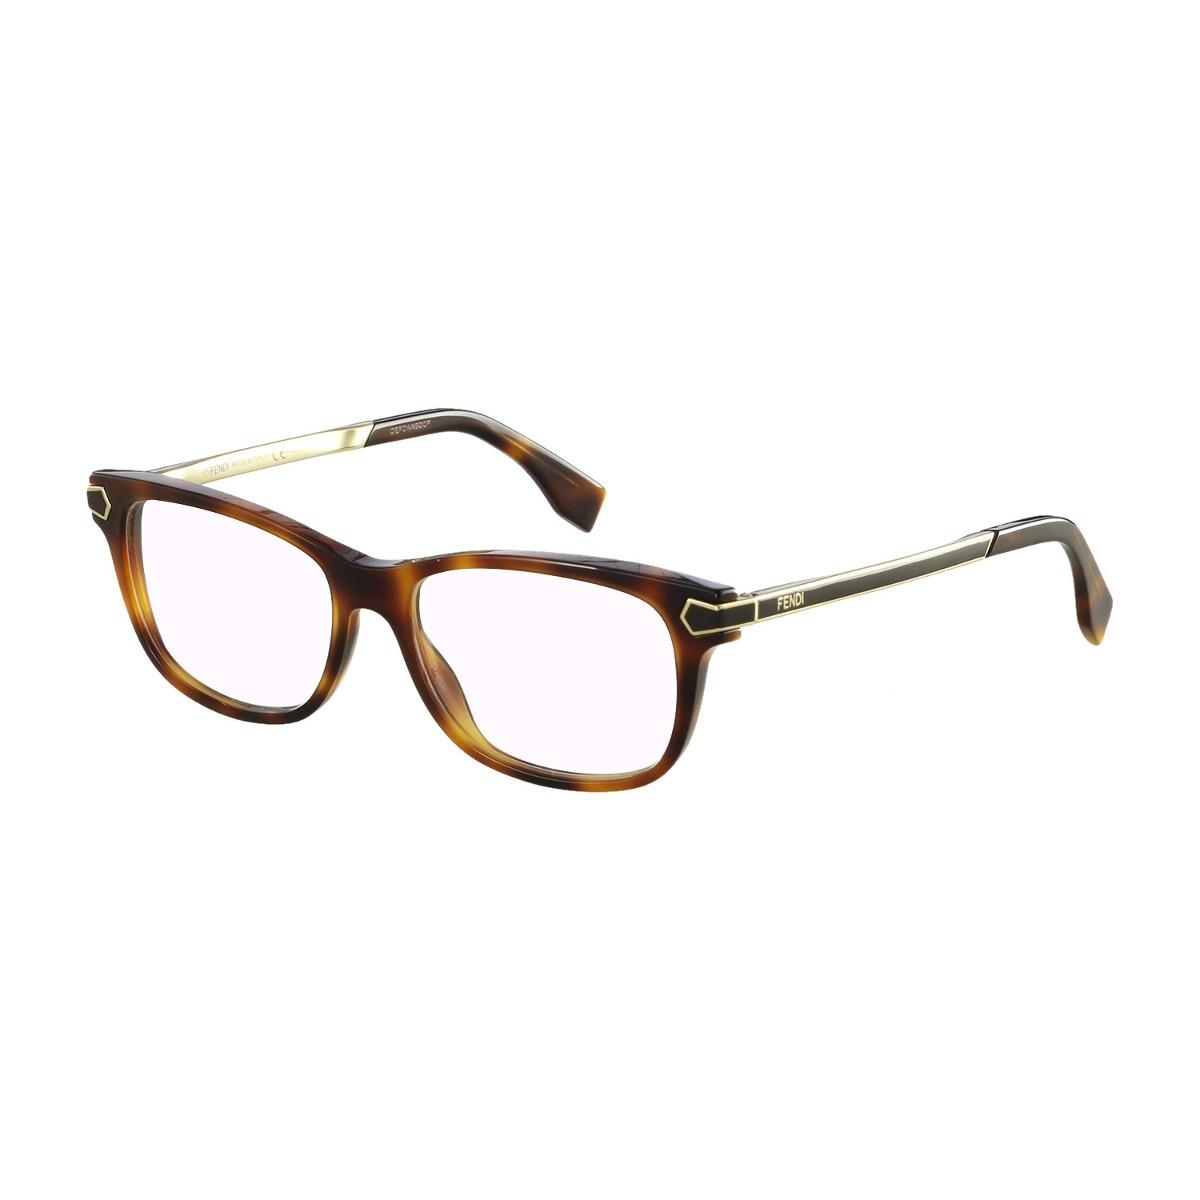 4d82946d184fc Óculos De Grau Fendi Casual Marrom - R  1.295,00 em Mercado Livre